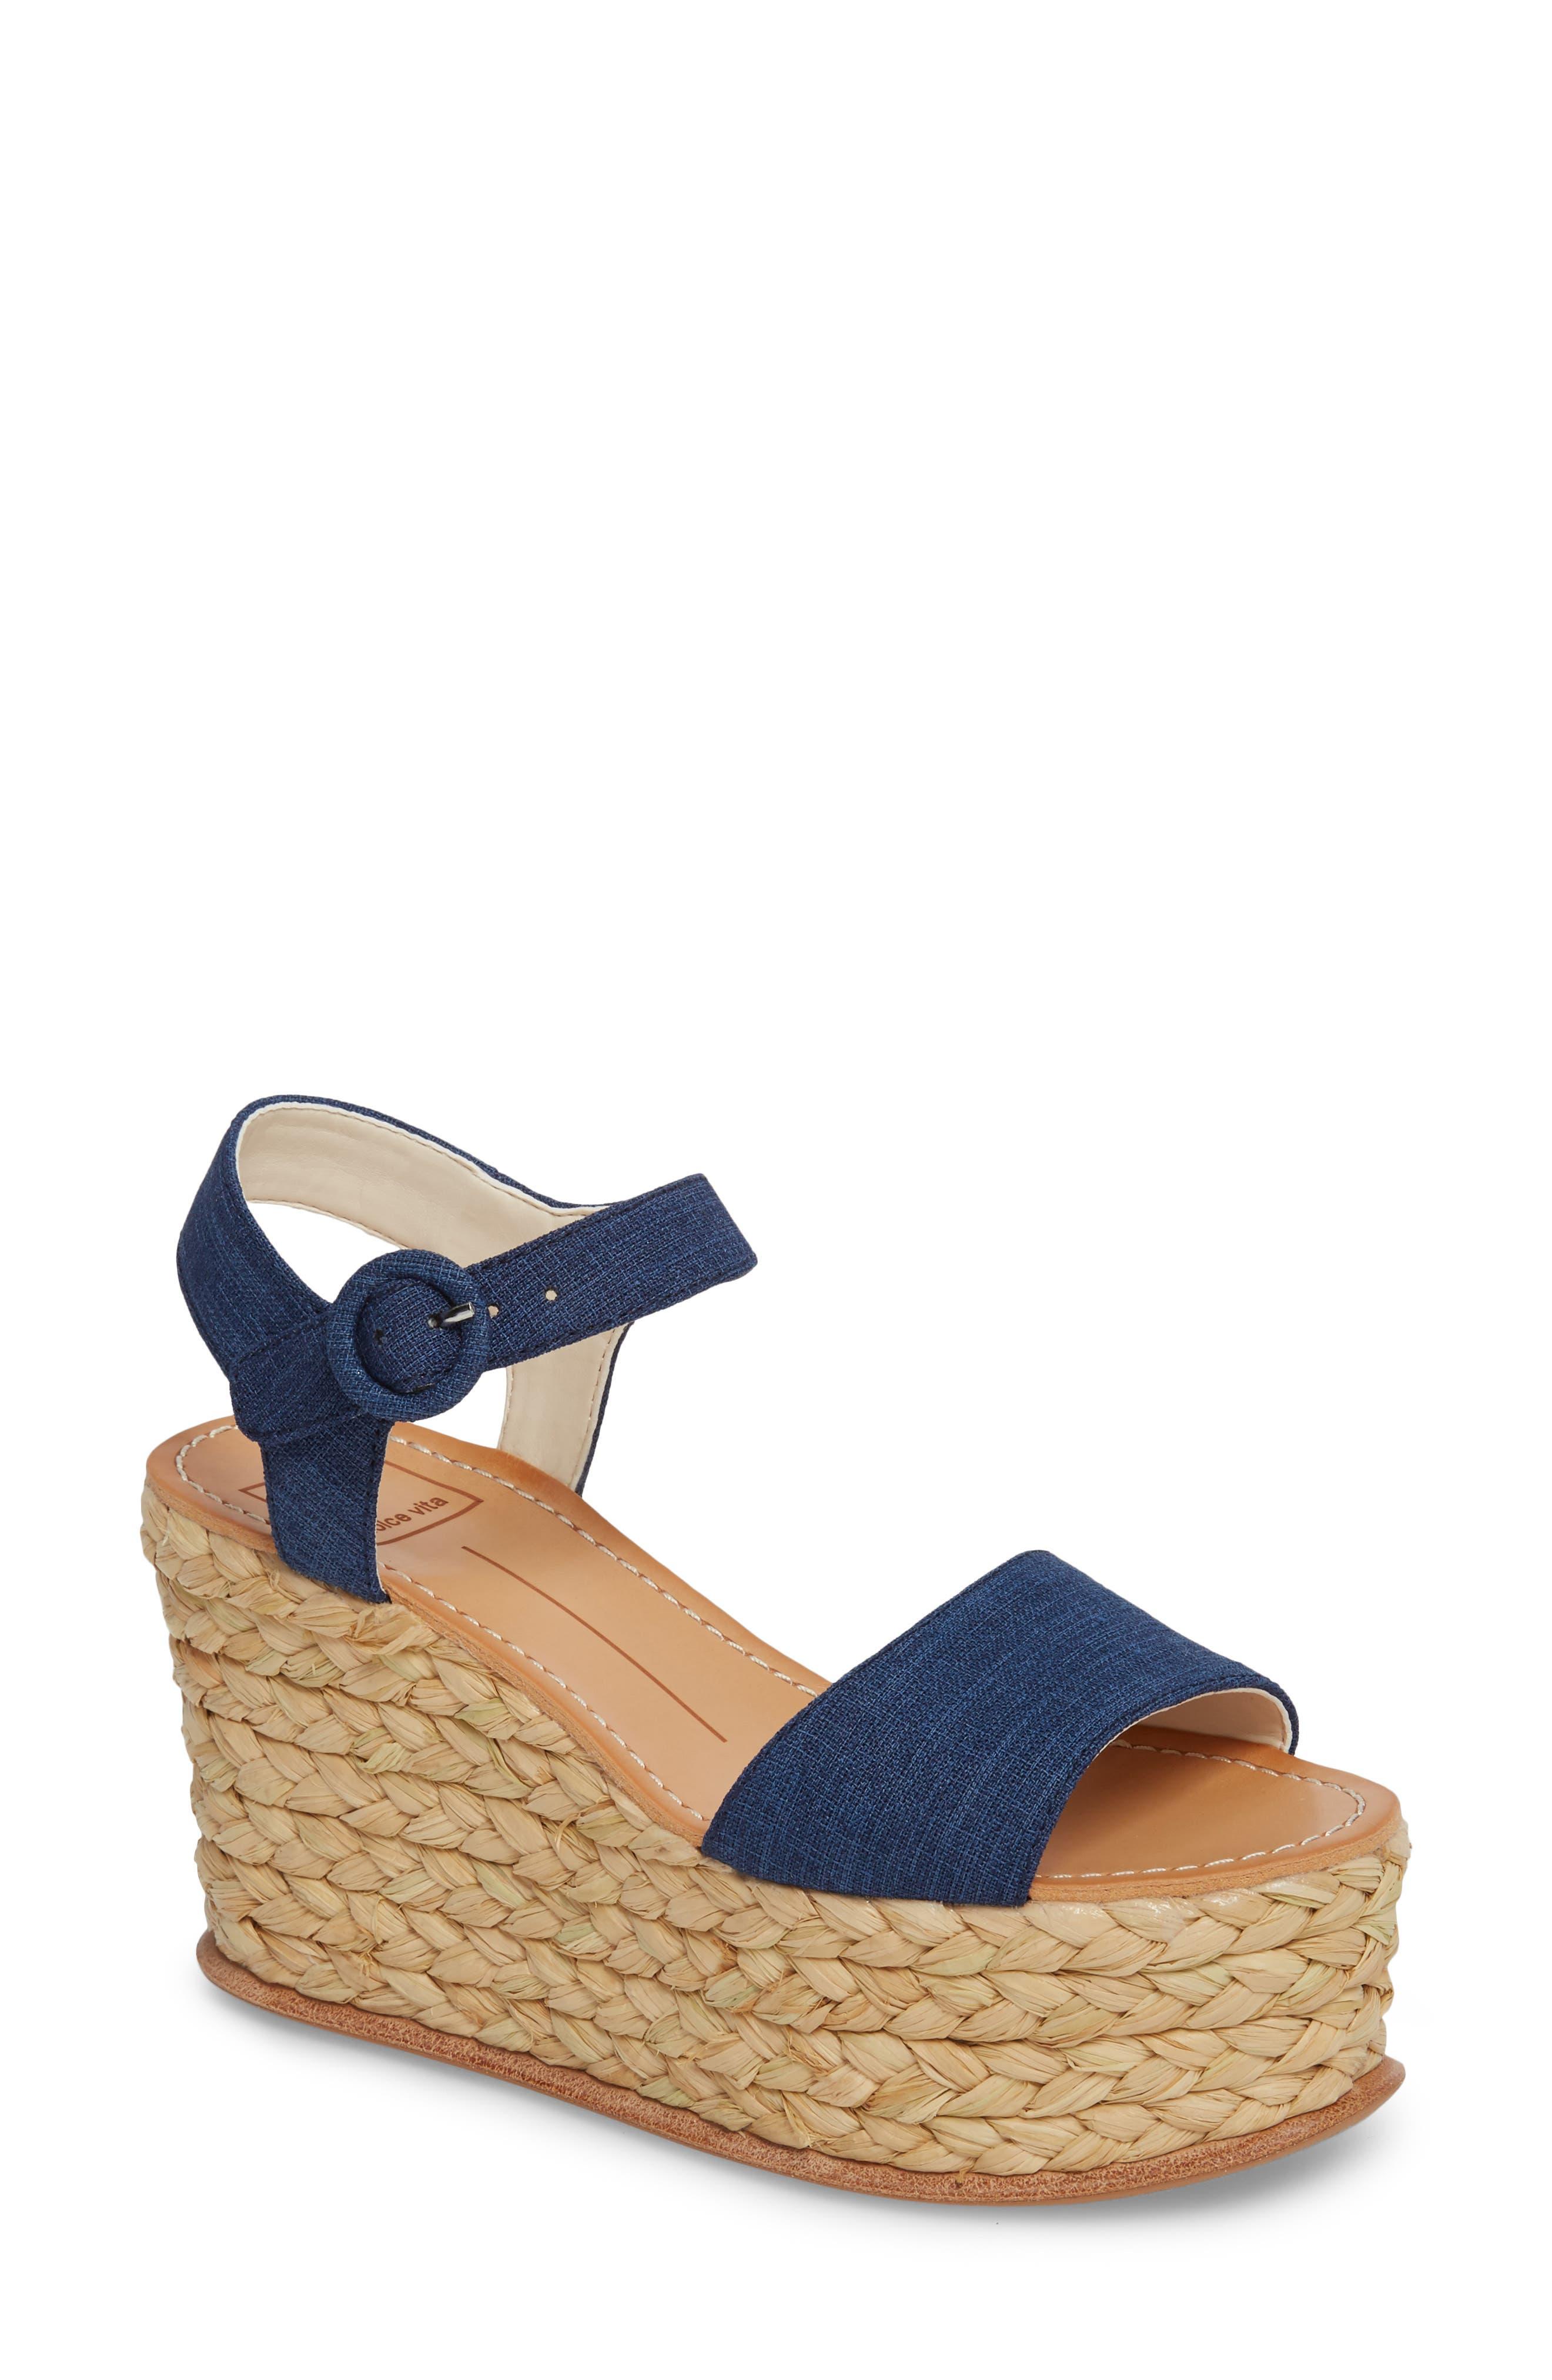 Dane Espadrille Wedge Sandal,                         Main,                         color, Indigo